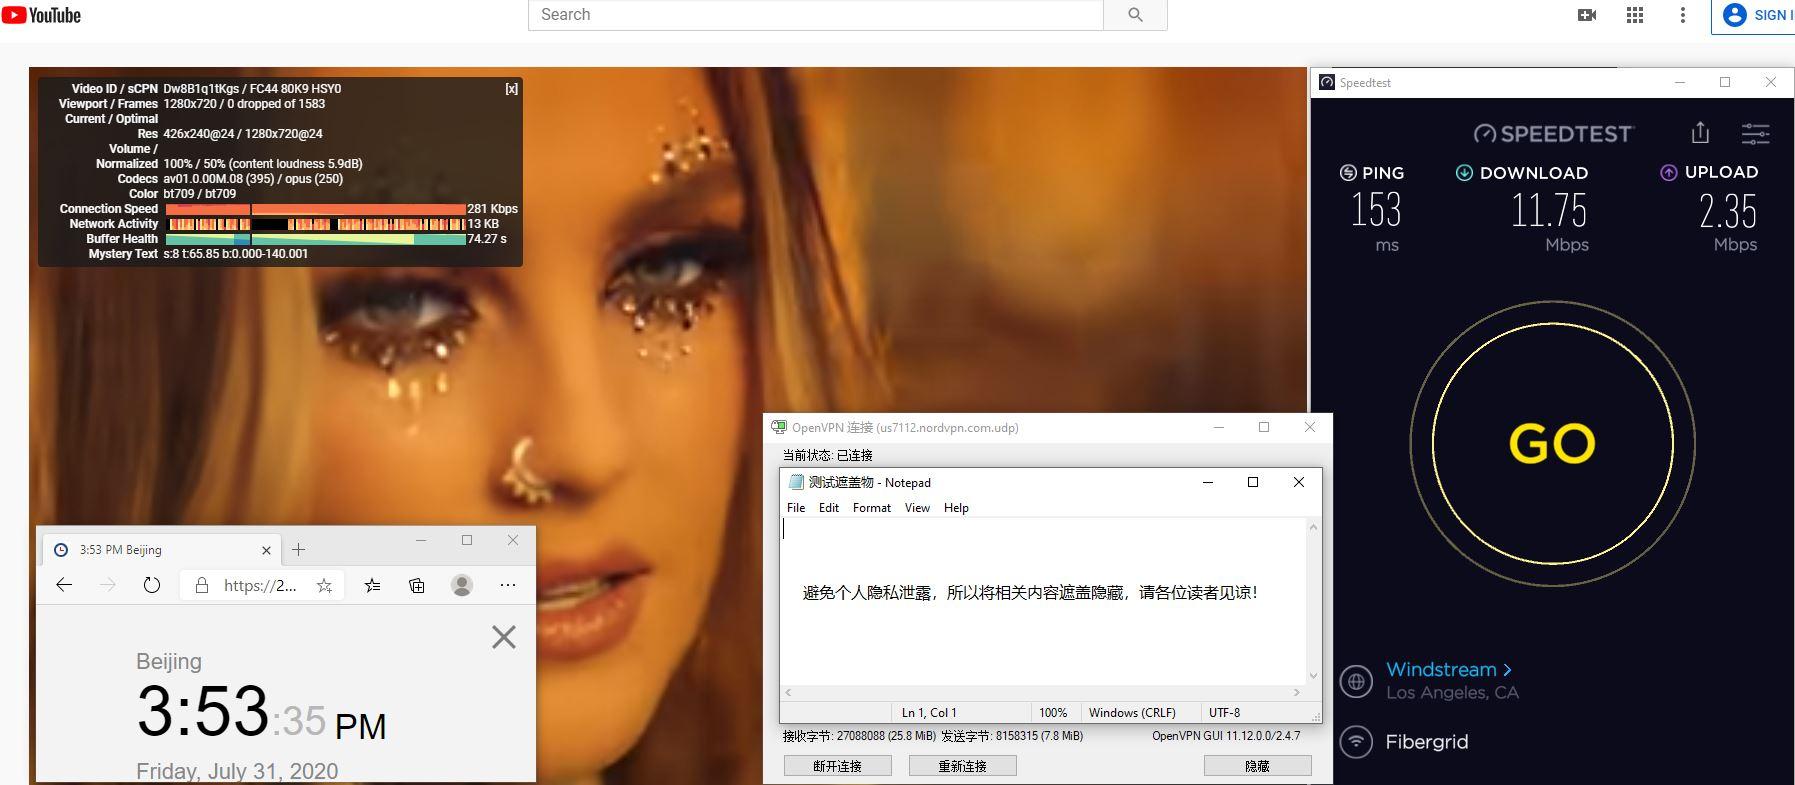 Windows10 NordVPN Openvpn us7112 中国VPN 翻墙 科学上网 翻墙速度测试 - 20200731